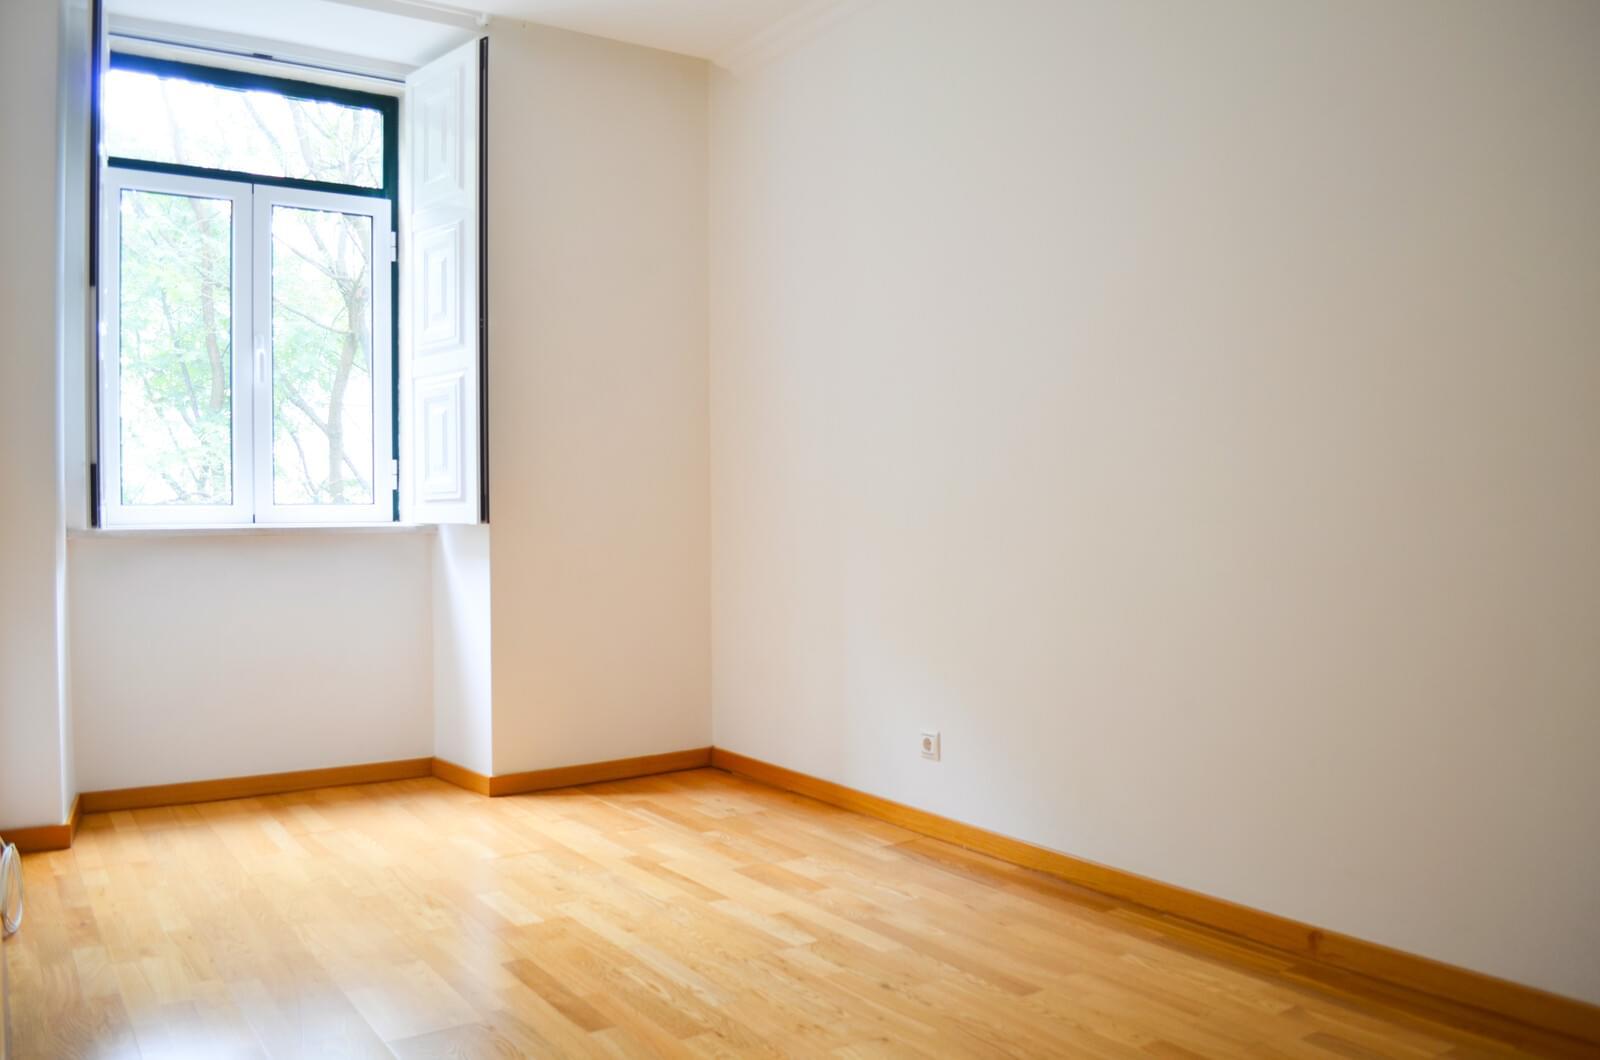 pf18839-apartamento-t2-lisboa-e16c335a-e2e2-44c7-b0b0-1c74c7bd3f55